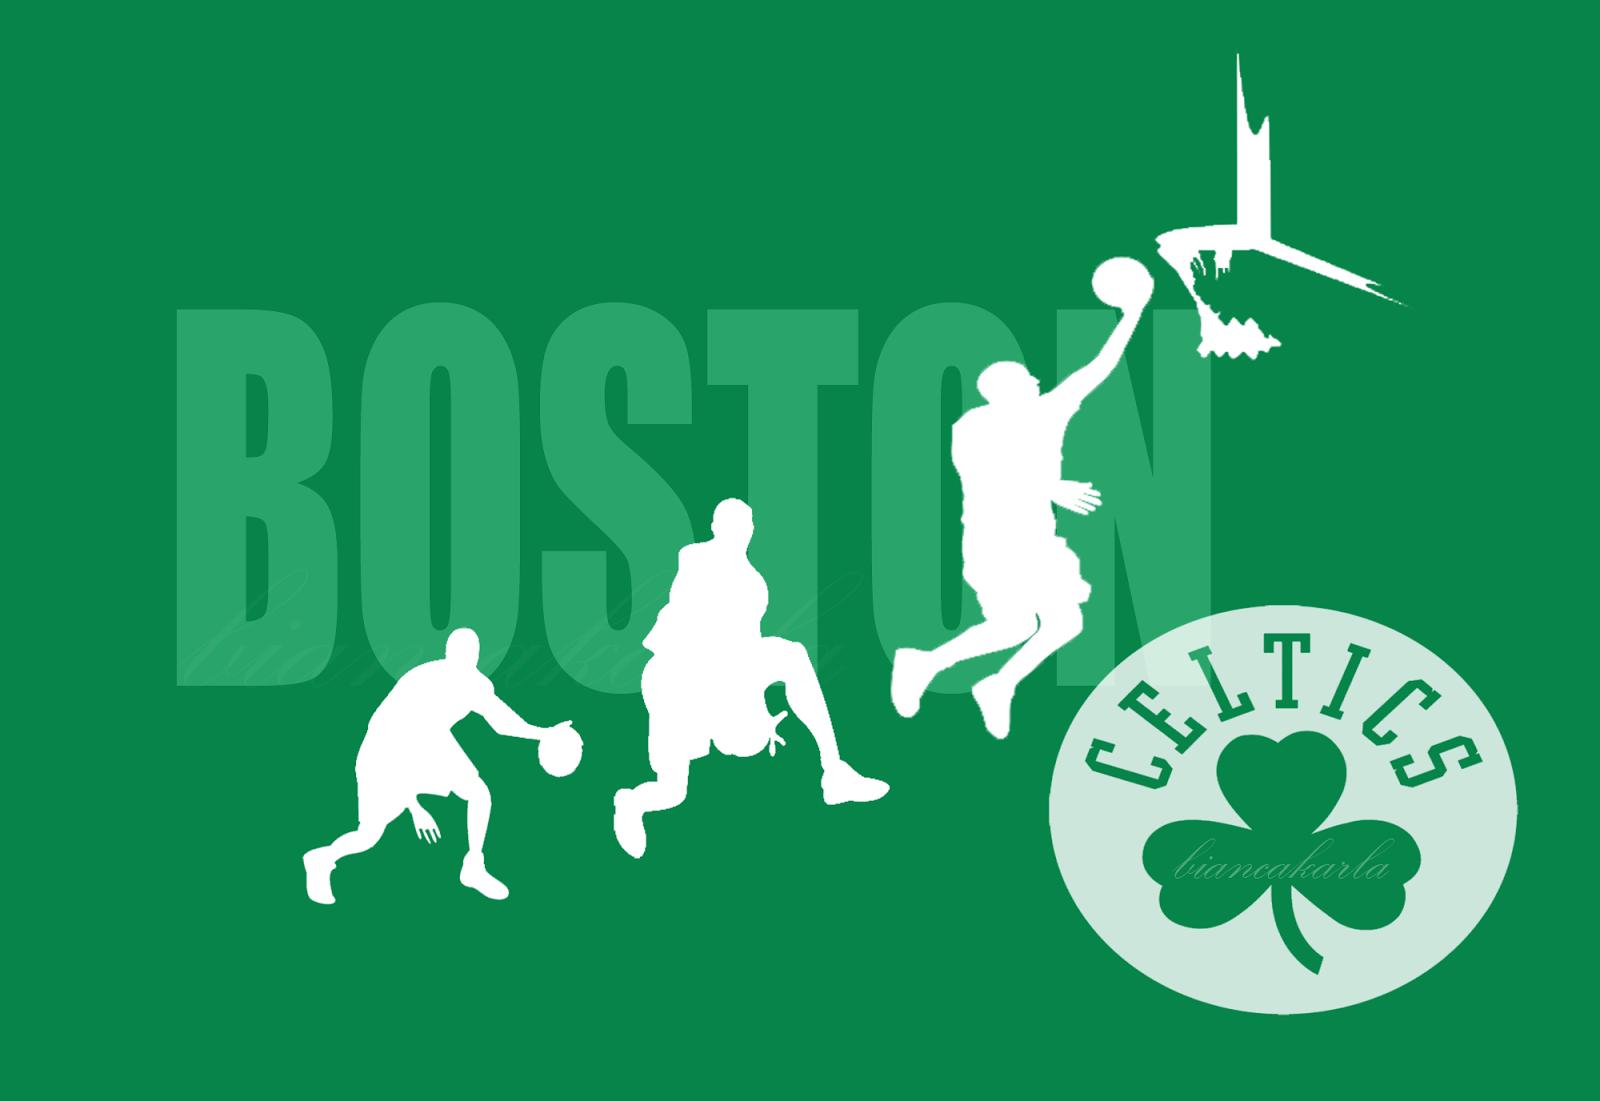 Free Download Boston Celtics Logo Nba Team Green Wallpapers Hd Desktop Background 1600x1101 For Your Desktop Mobile Tablet Explore 48 Boston Celtics Desktop Wallpaper Celtic Wallpaper Boston Pictures Wallpaper